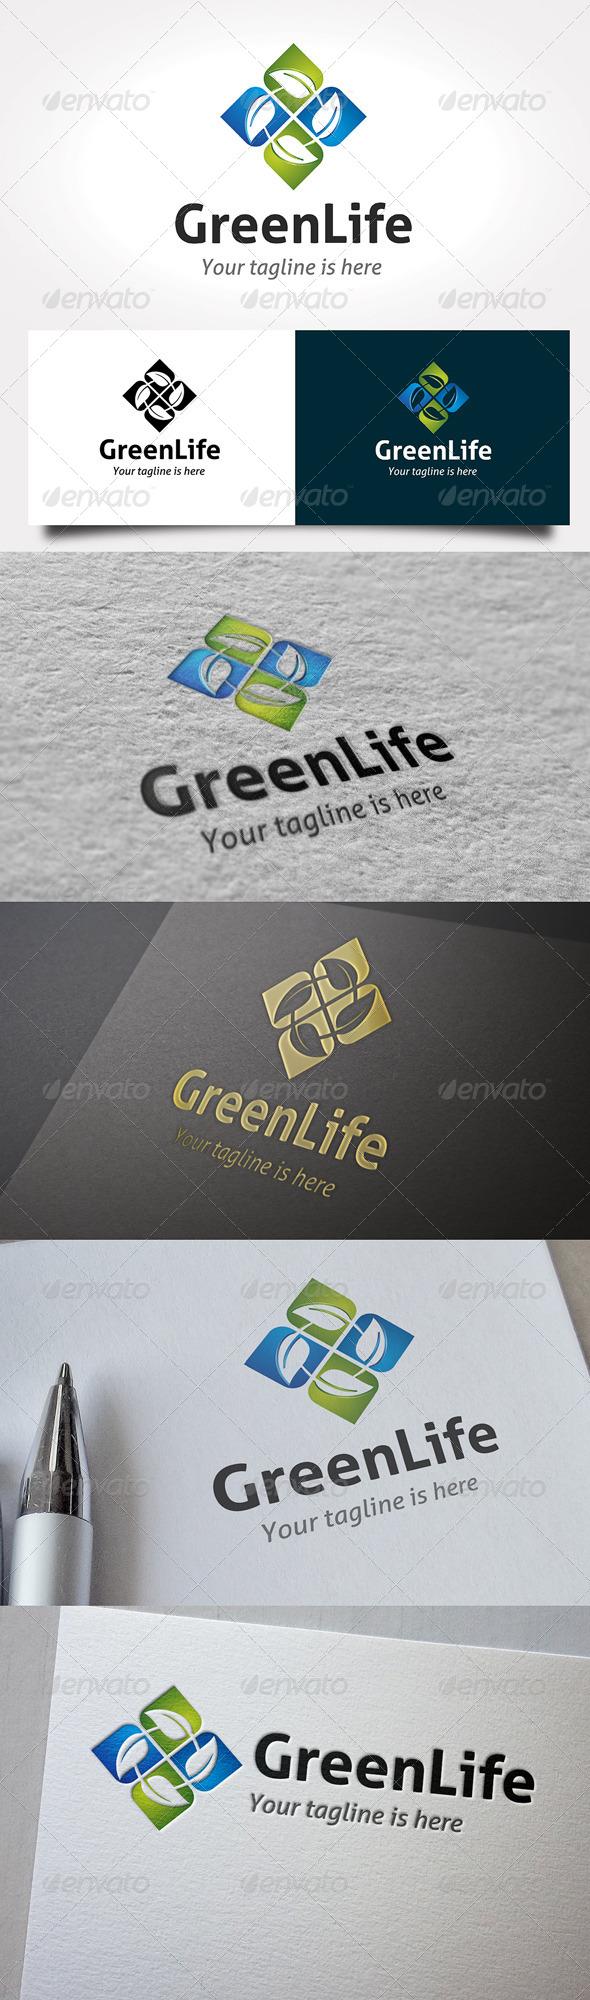 GraphicRiver Green Life Logo 6469792